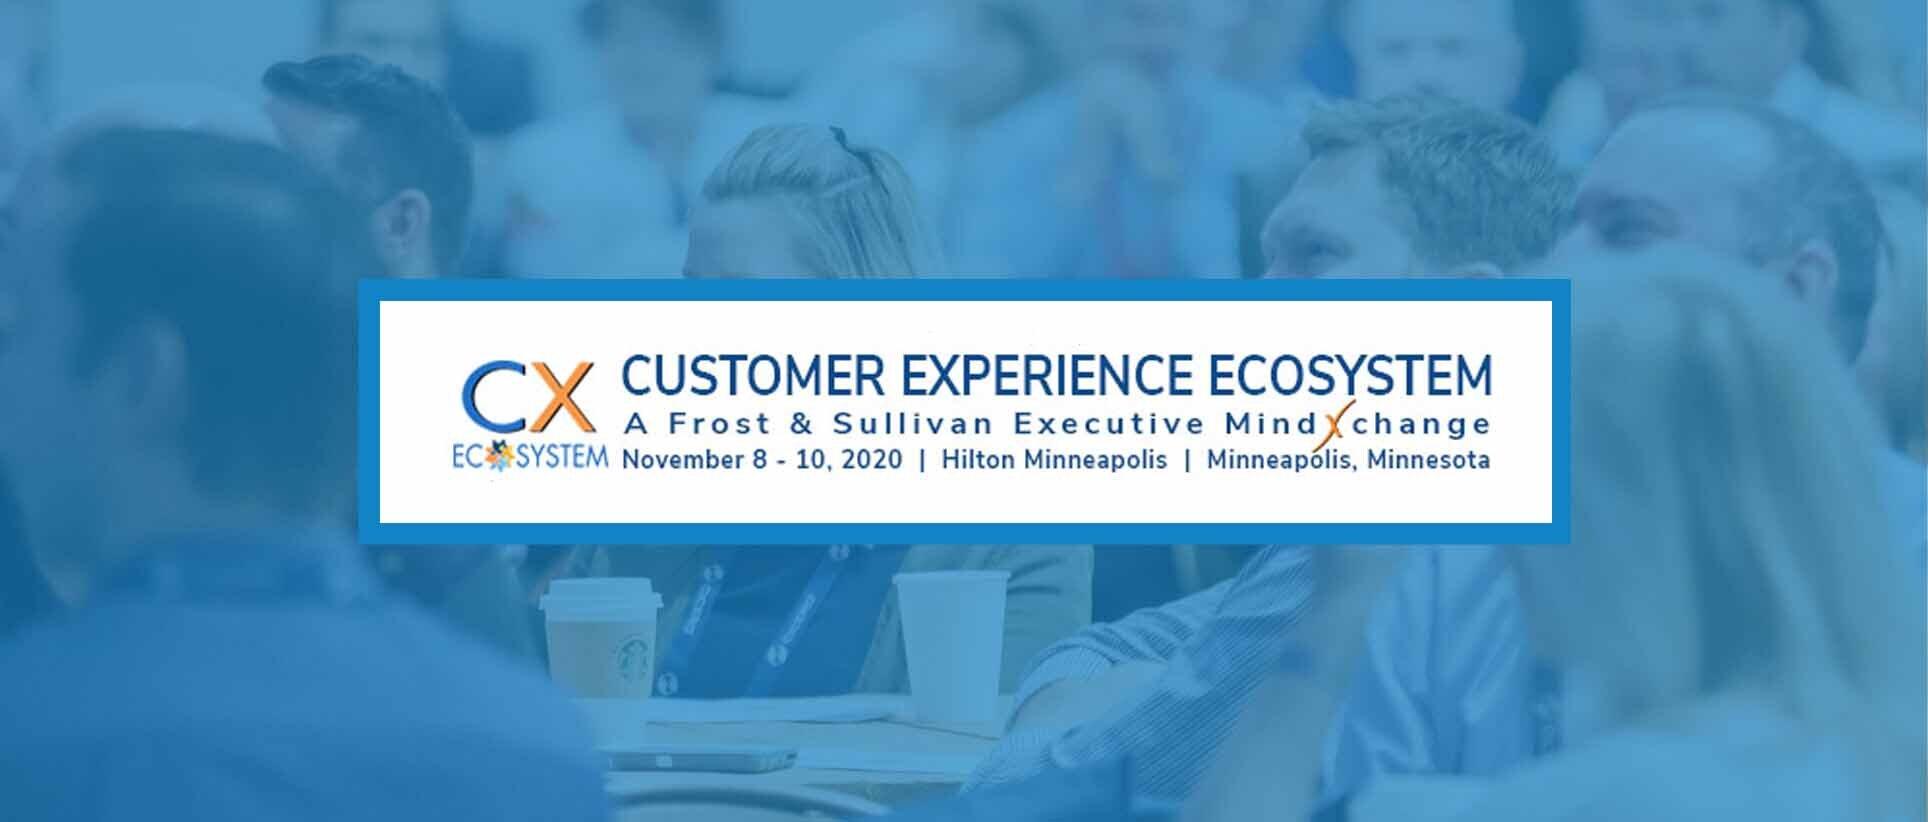 Customer Experience Ecosystem Logo